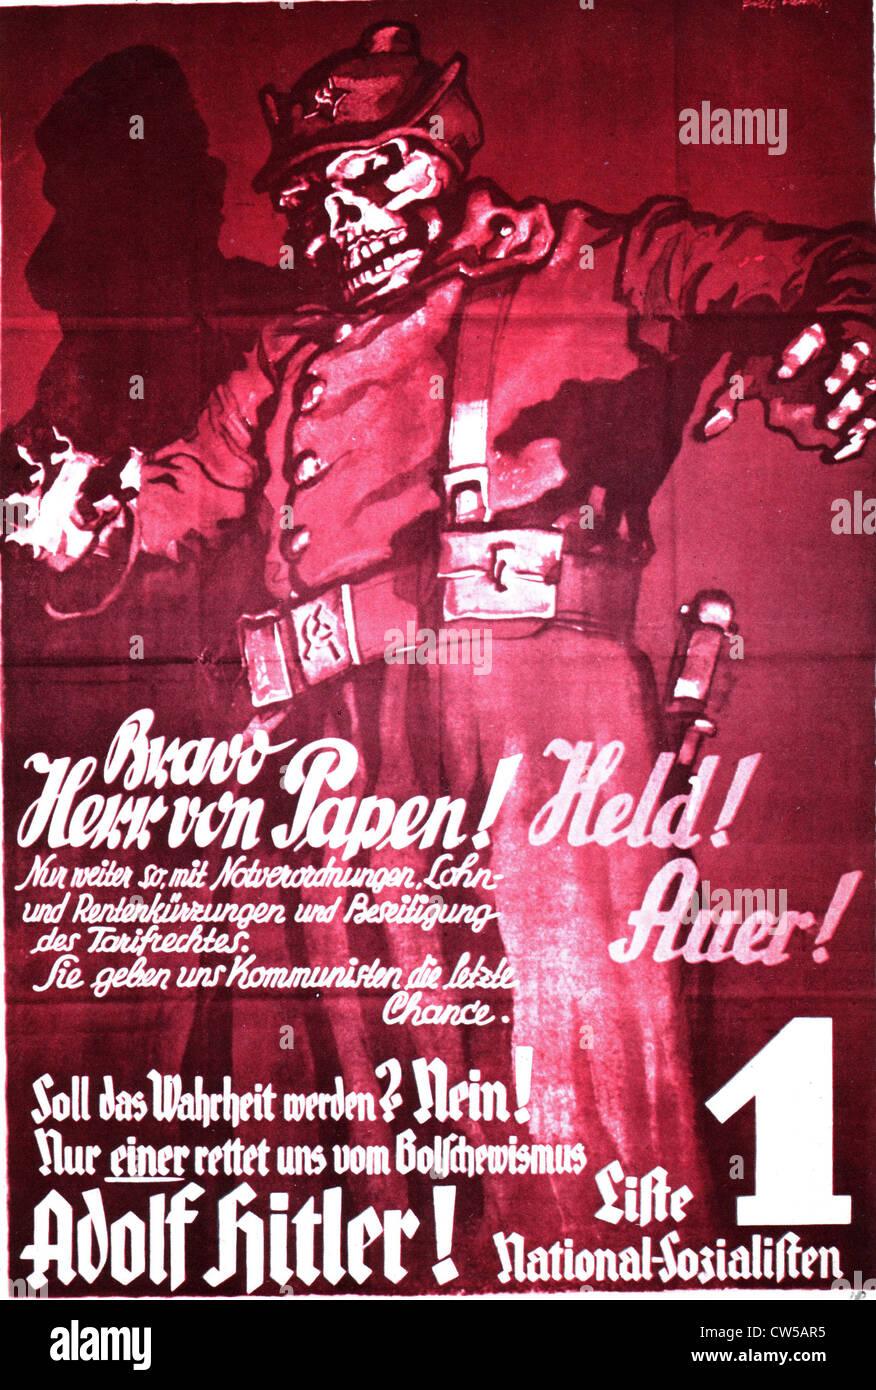 Nazi Party electoral propaganda poster - Stock Image